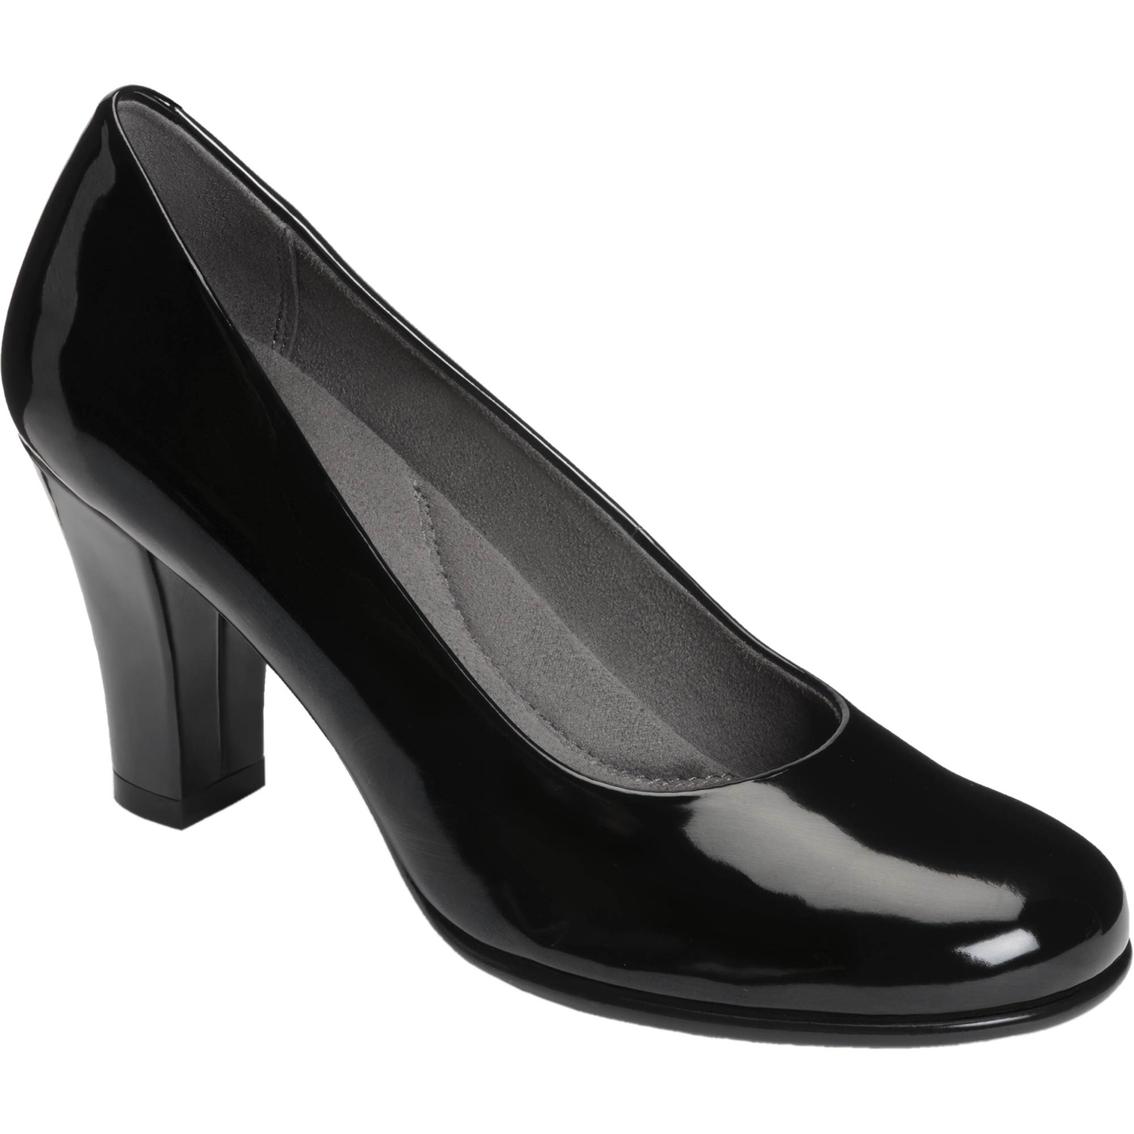 932e2275c79 Aerosoles Major Role Covered Heel Pumps | Rounded-toe | Shoes | Shop ...